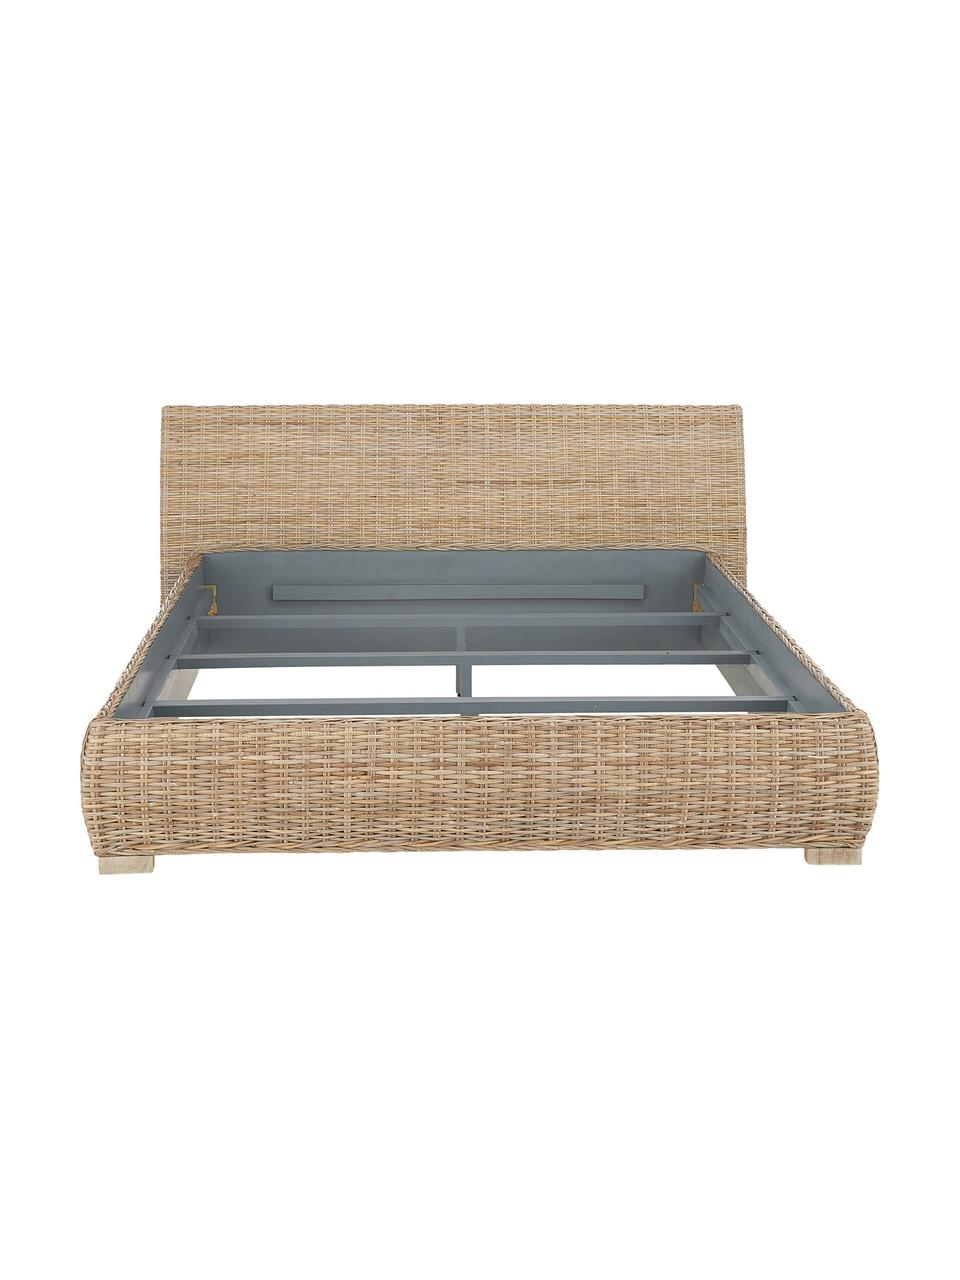 Łóżko z rattanu Kubu, Rattan, S 160 x D 200 cm